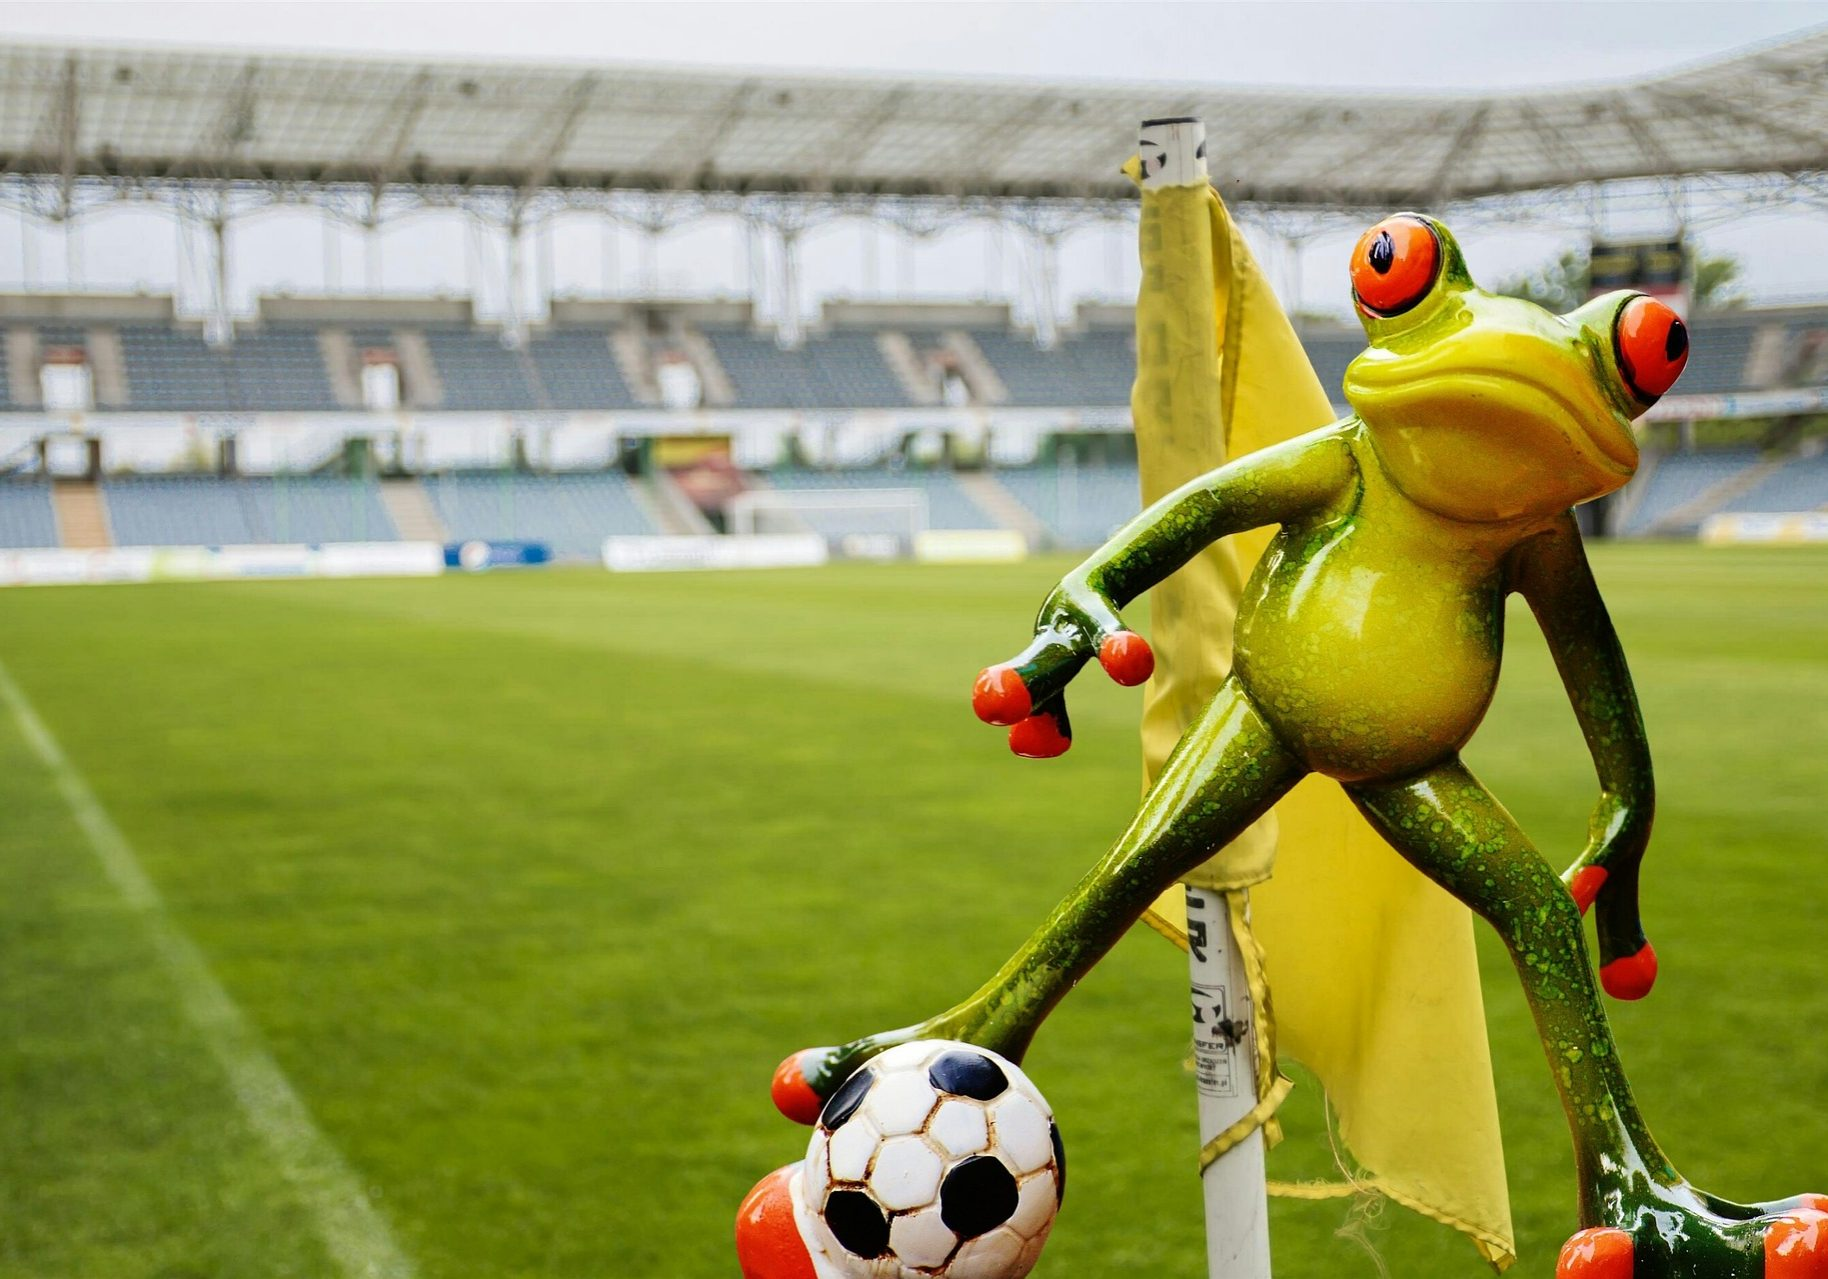 Frog stadium